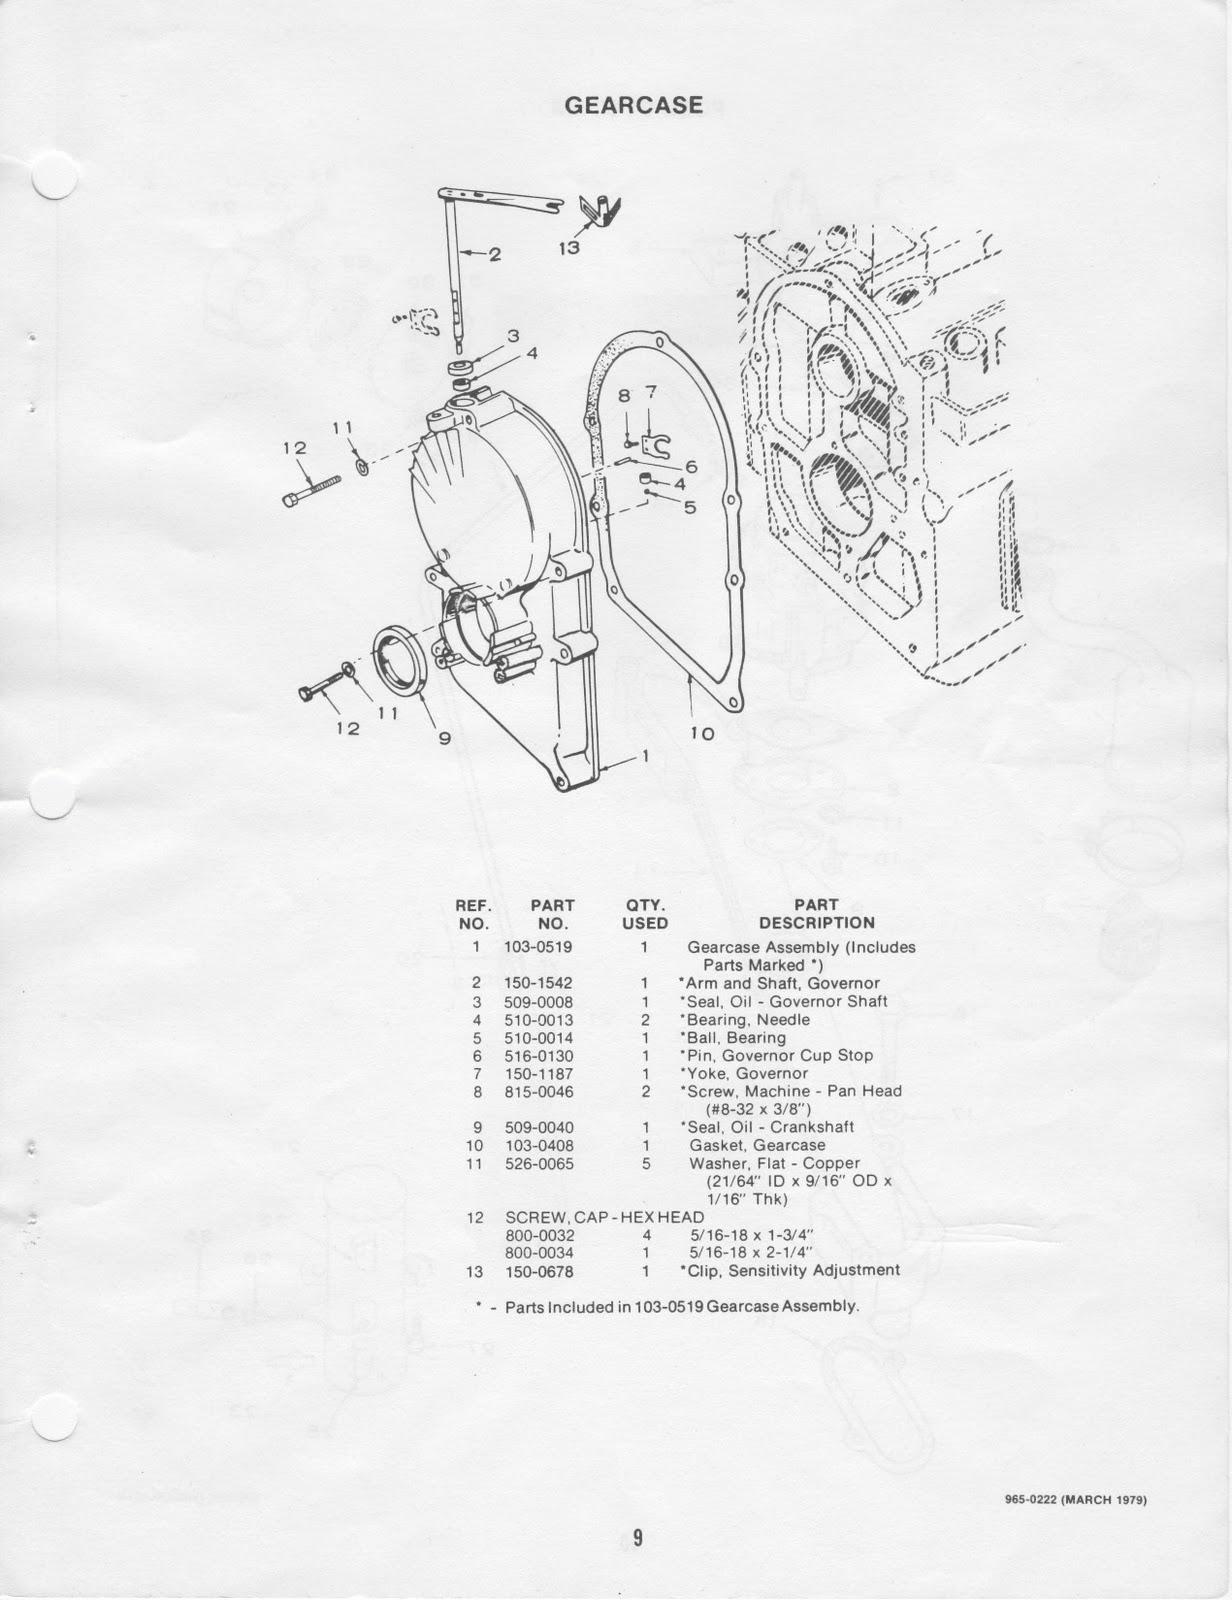 onan rv wiring diagram for onan kw generator on duromax generator  wiring diagram, onan wiring circuit